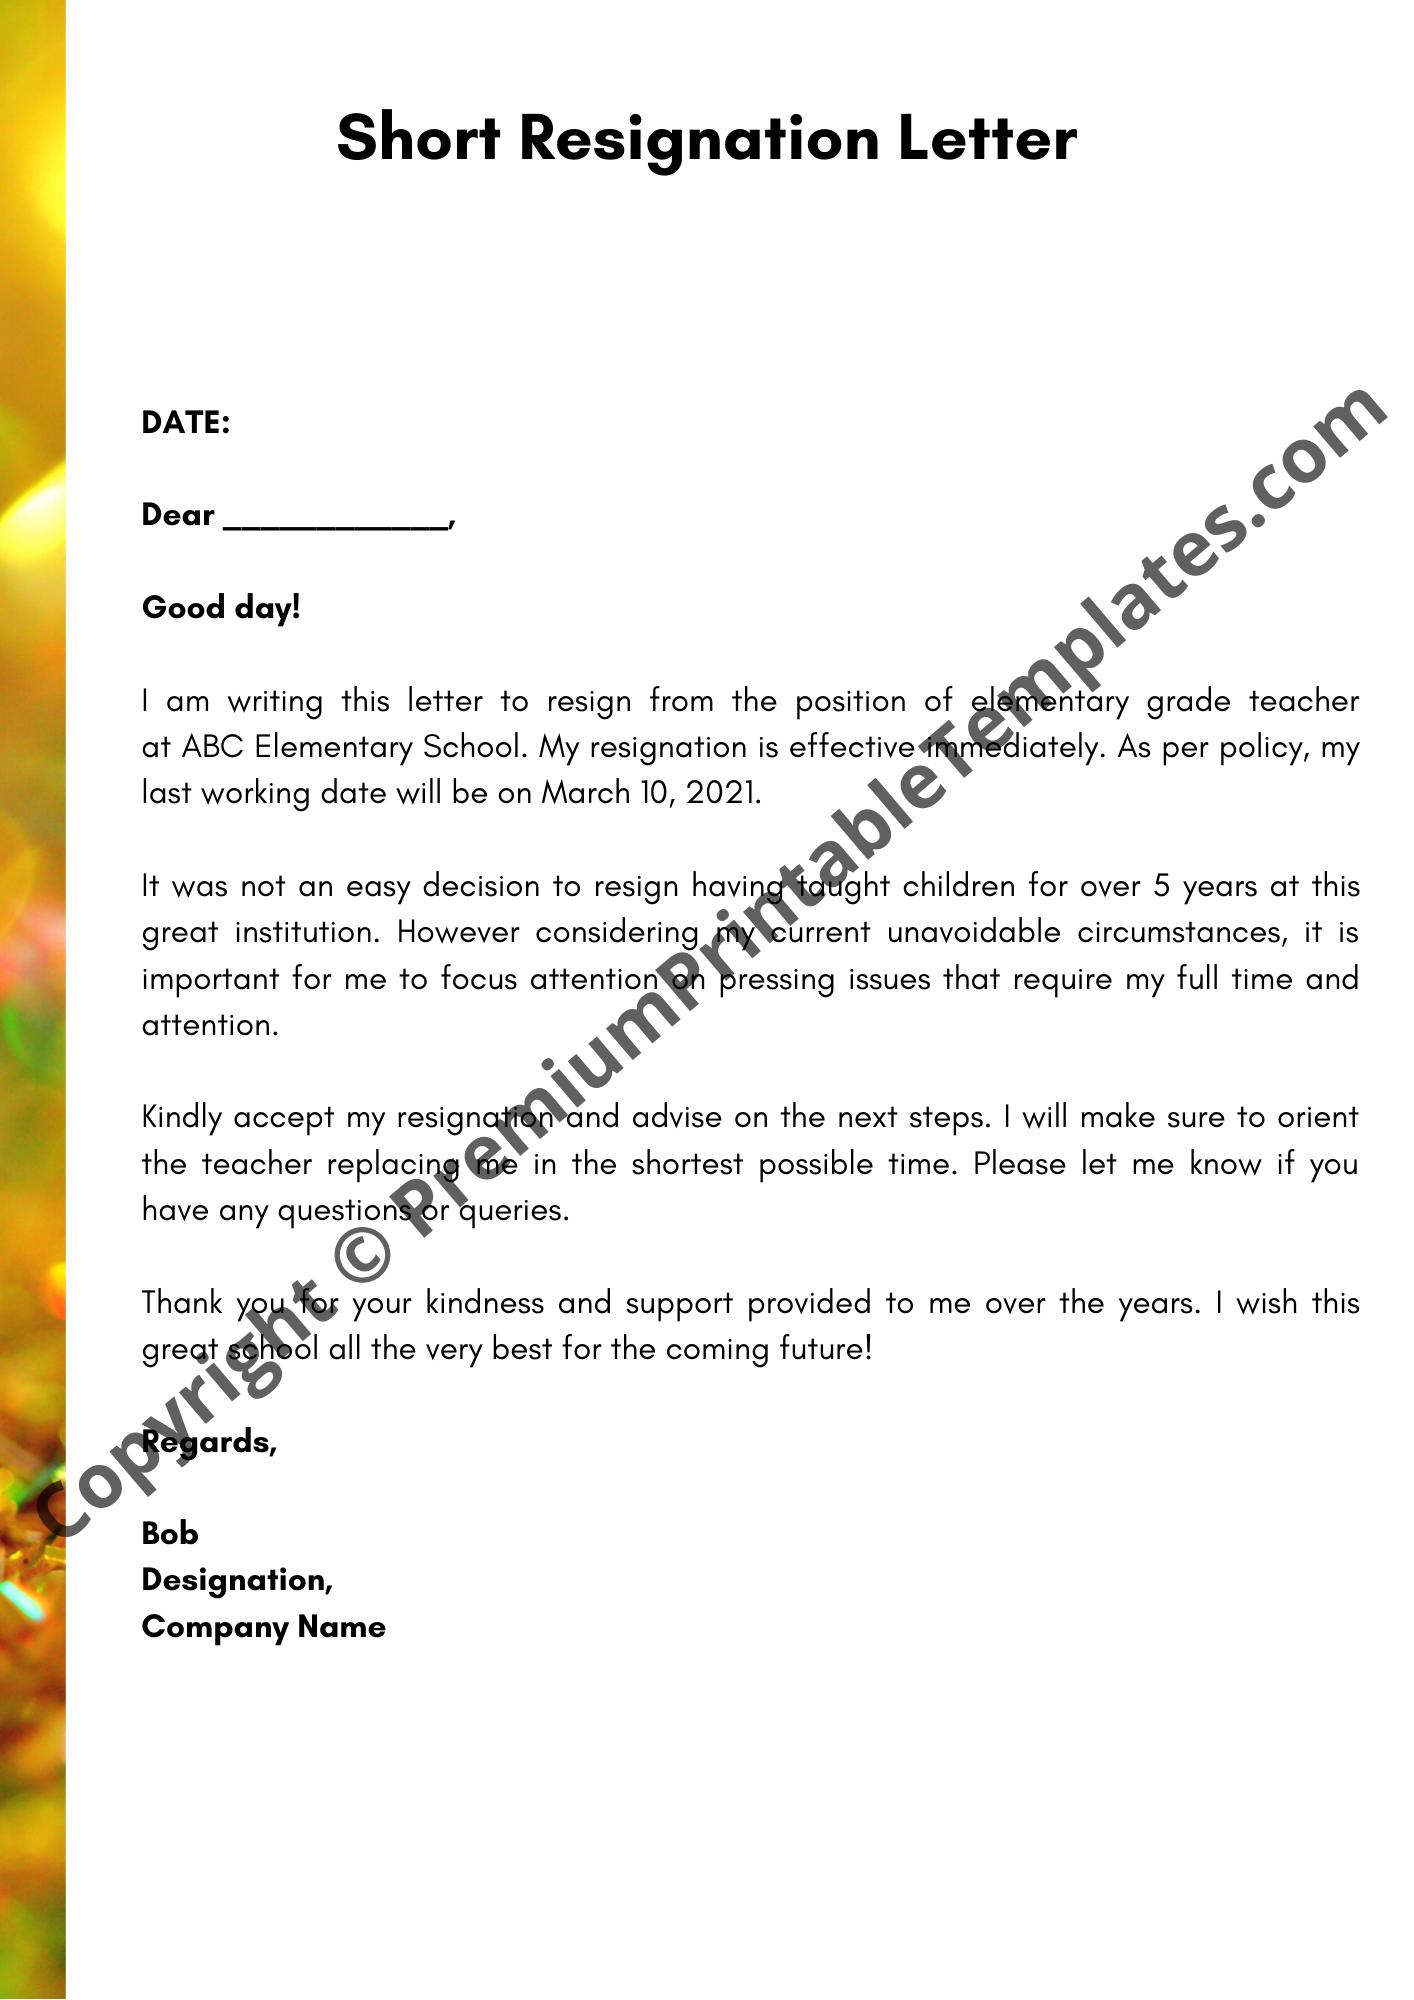 Resignation Letter Examples For Teachers from premiumprintabletemplates.com